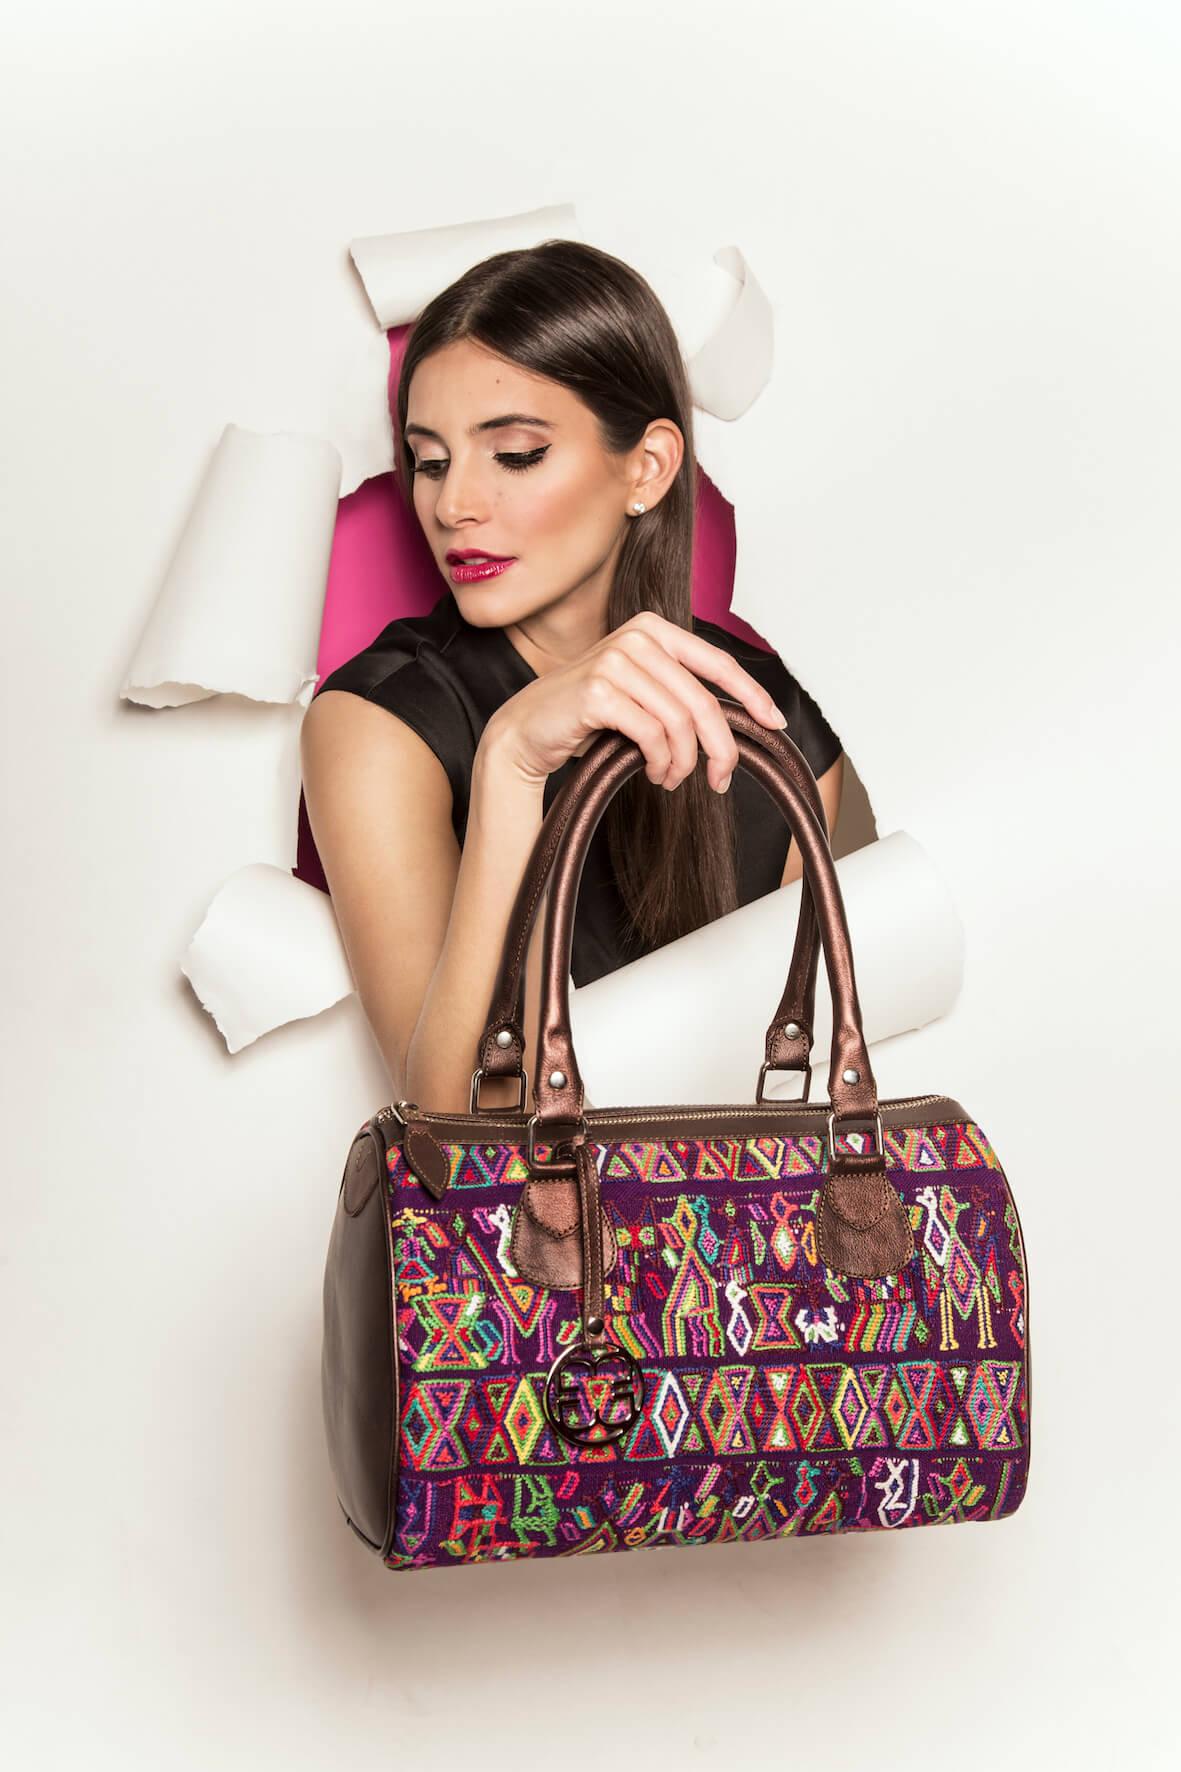 marias-bag-img_1727